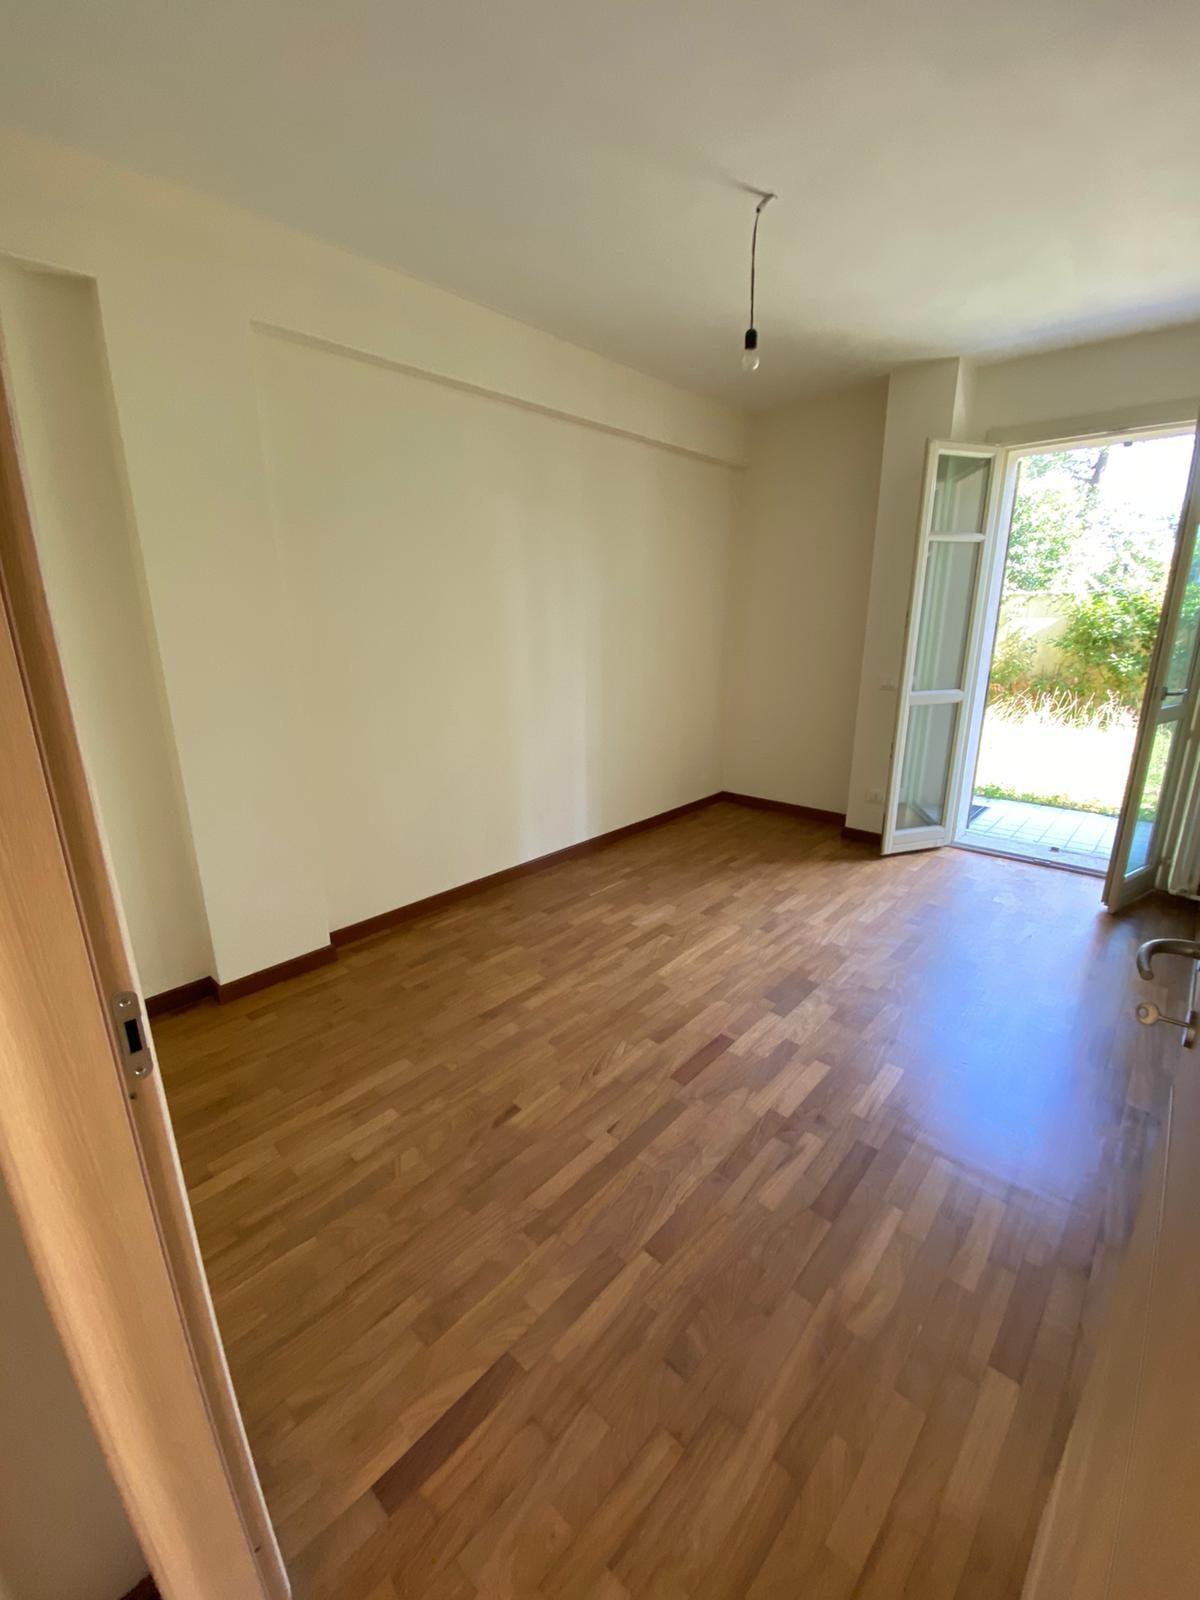 Appartamento in vendita, rif. VTT - 158